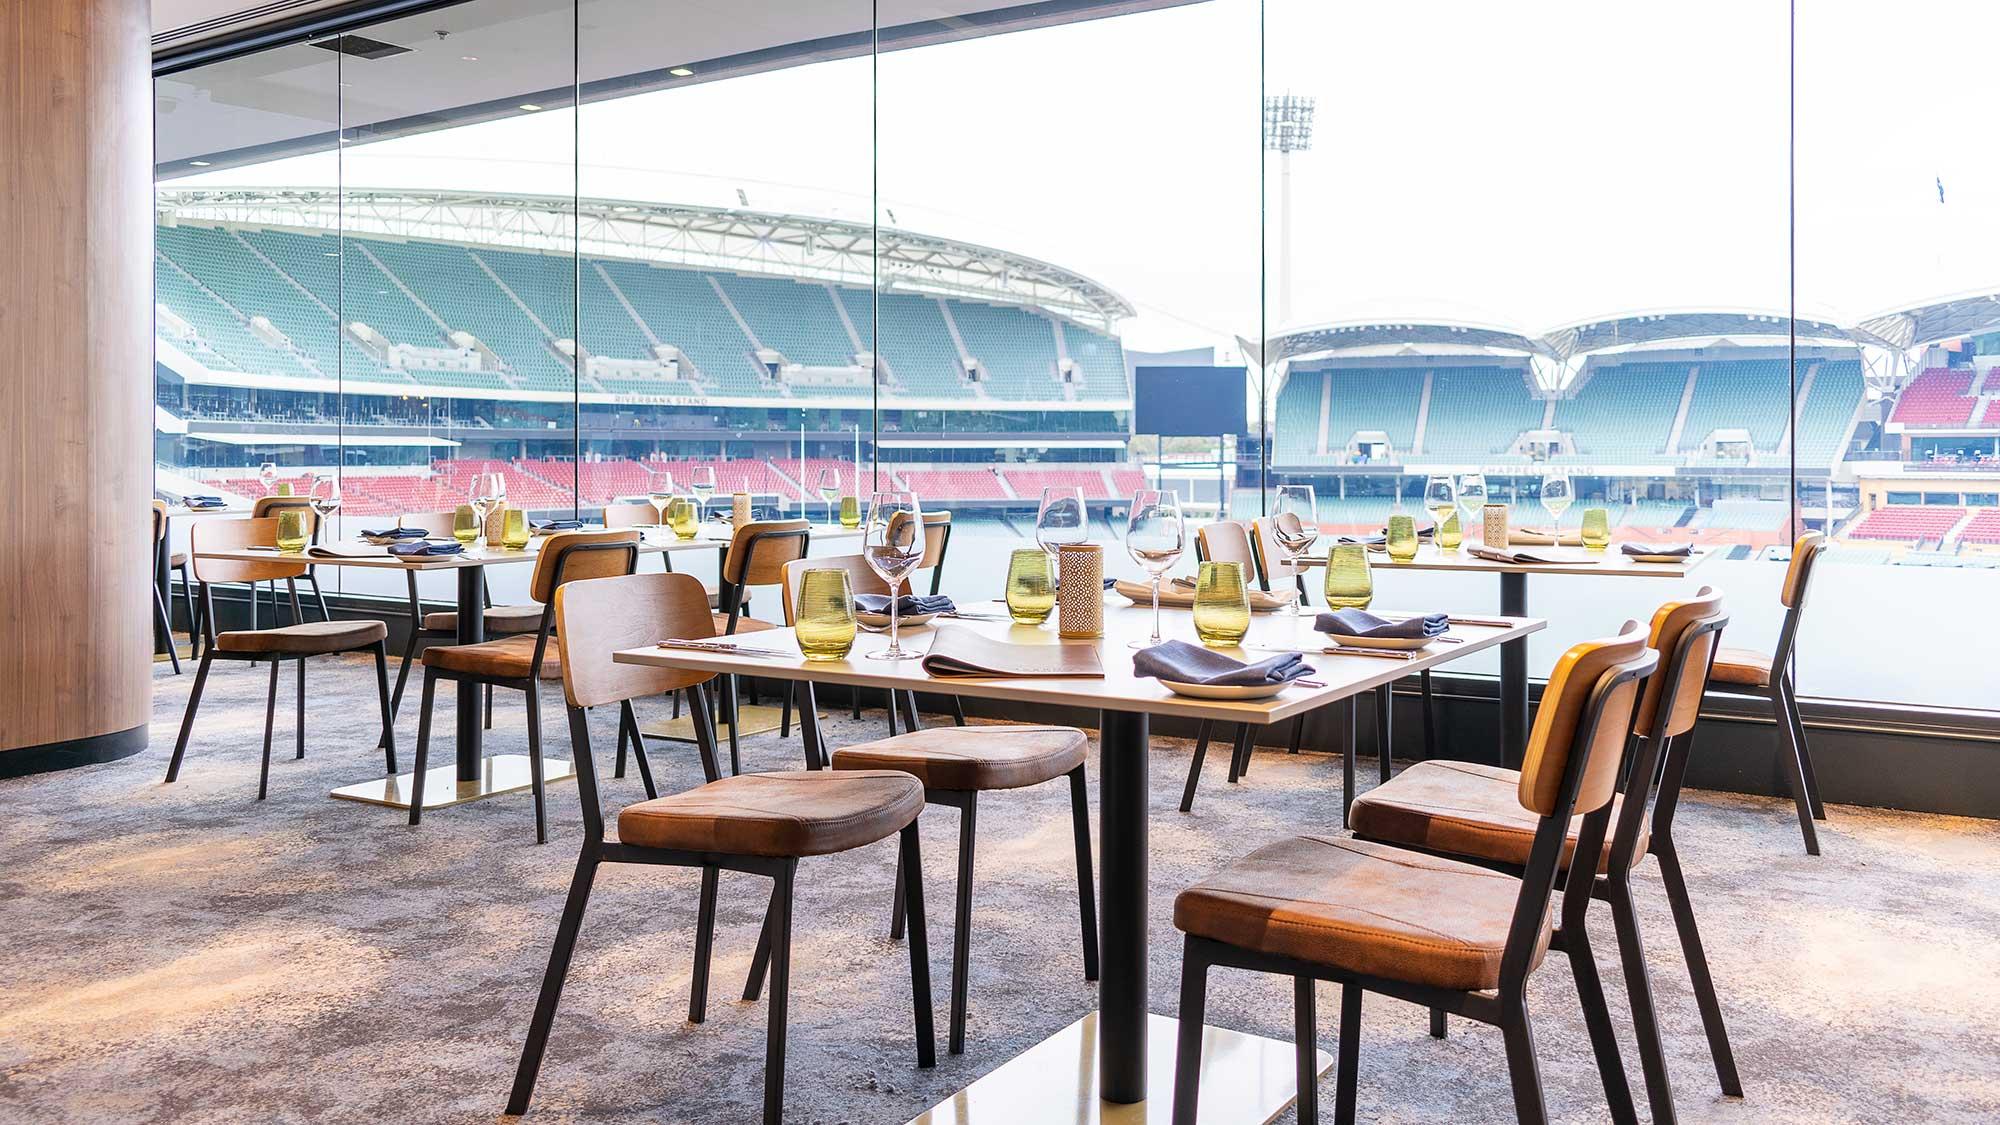 Bespoke at Adelaide Oval